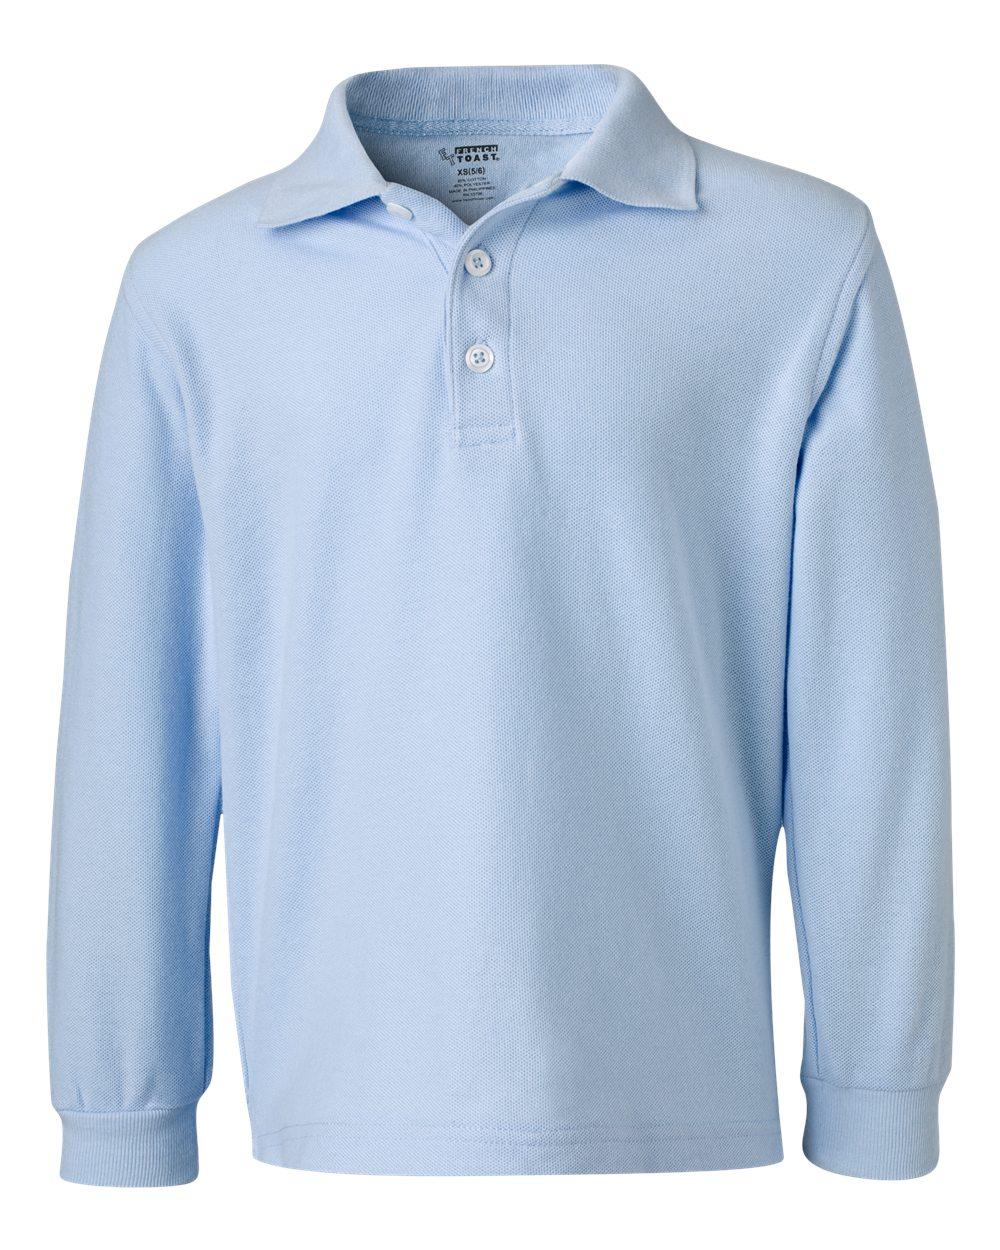 French Toast School Uniform Boys Long Sleeve Pique Polo Shirt. A9085